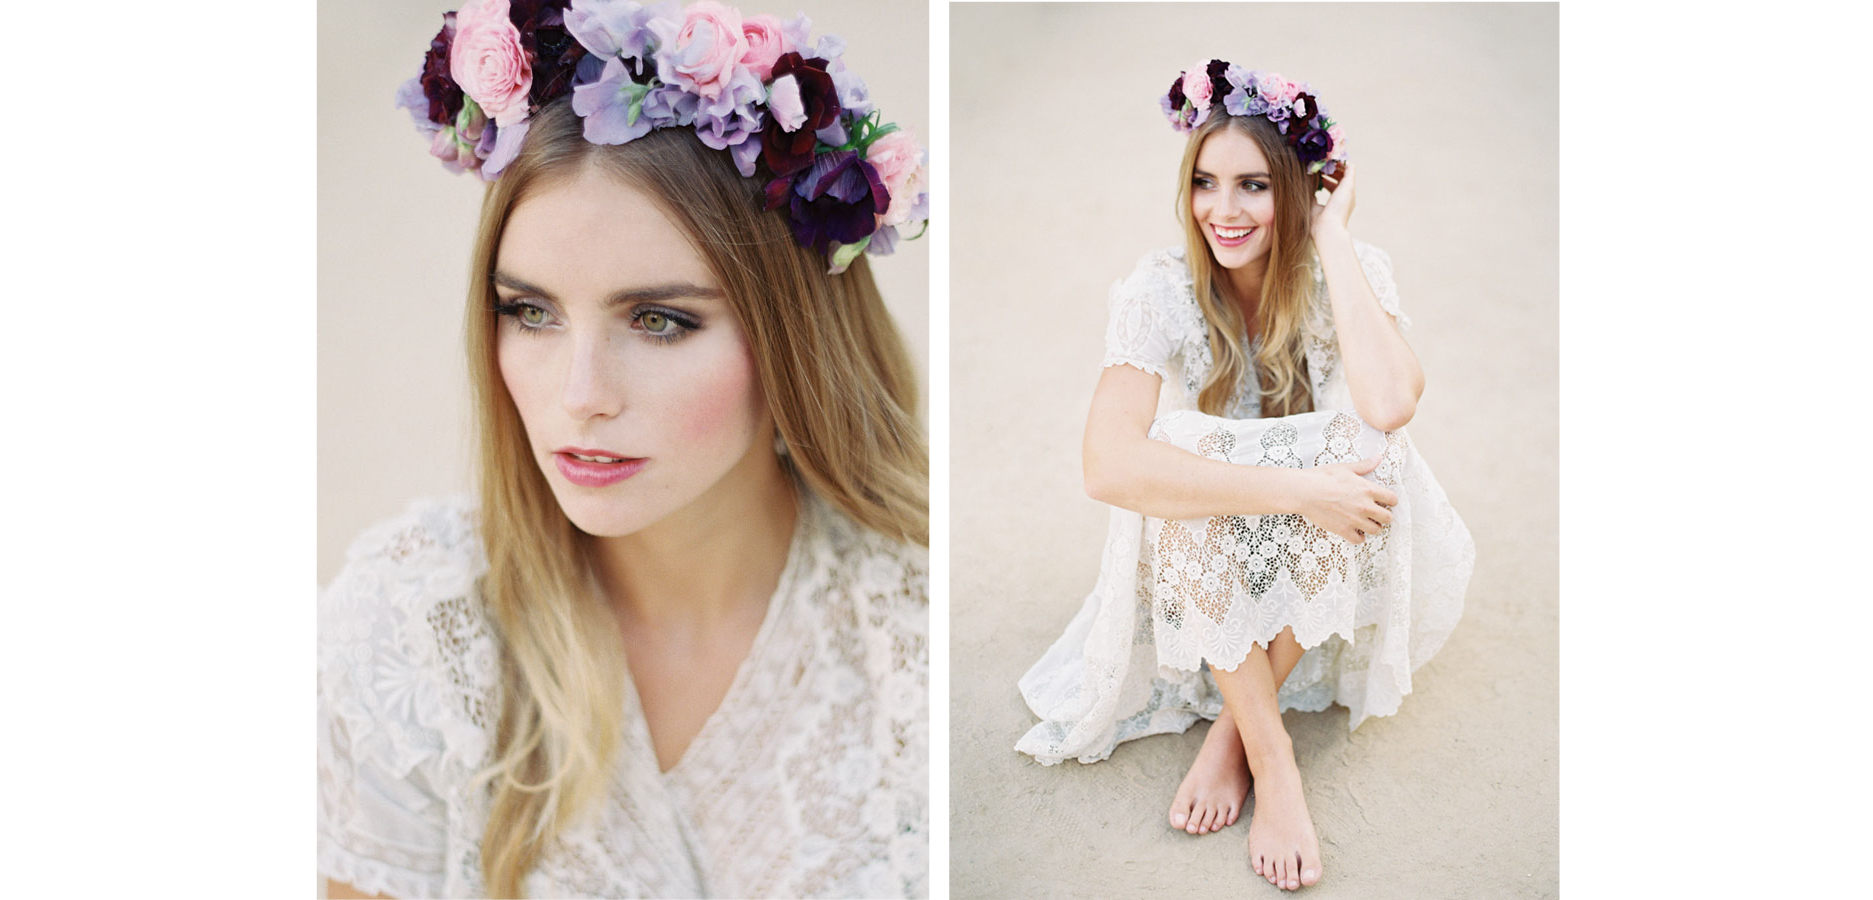 Jess-Wilcox-Hair-Makeup-Wedding_portfolio2.jpg